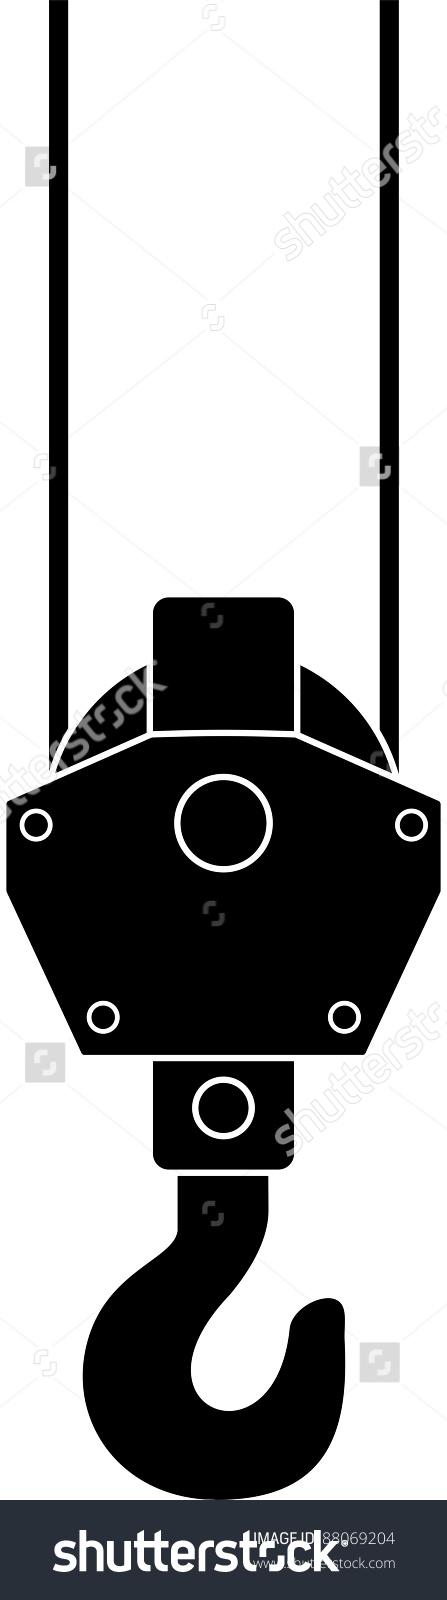 Vector Hook Crane Hoist Illustration Isolated Stock Vector.